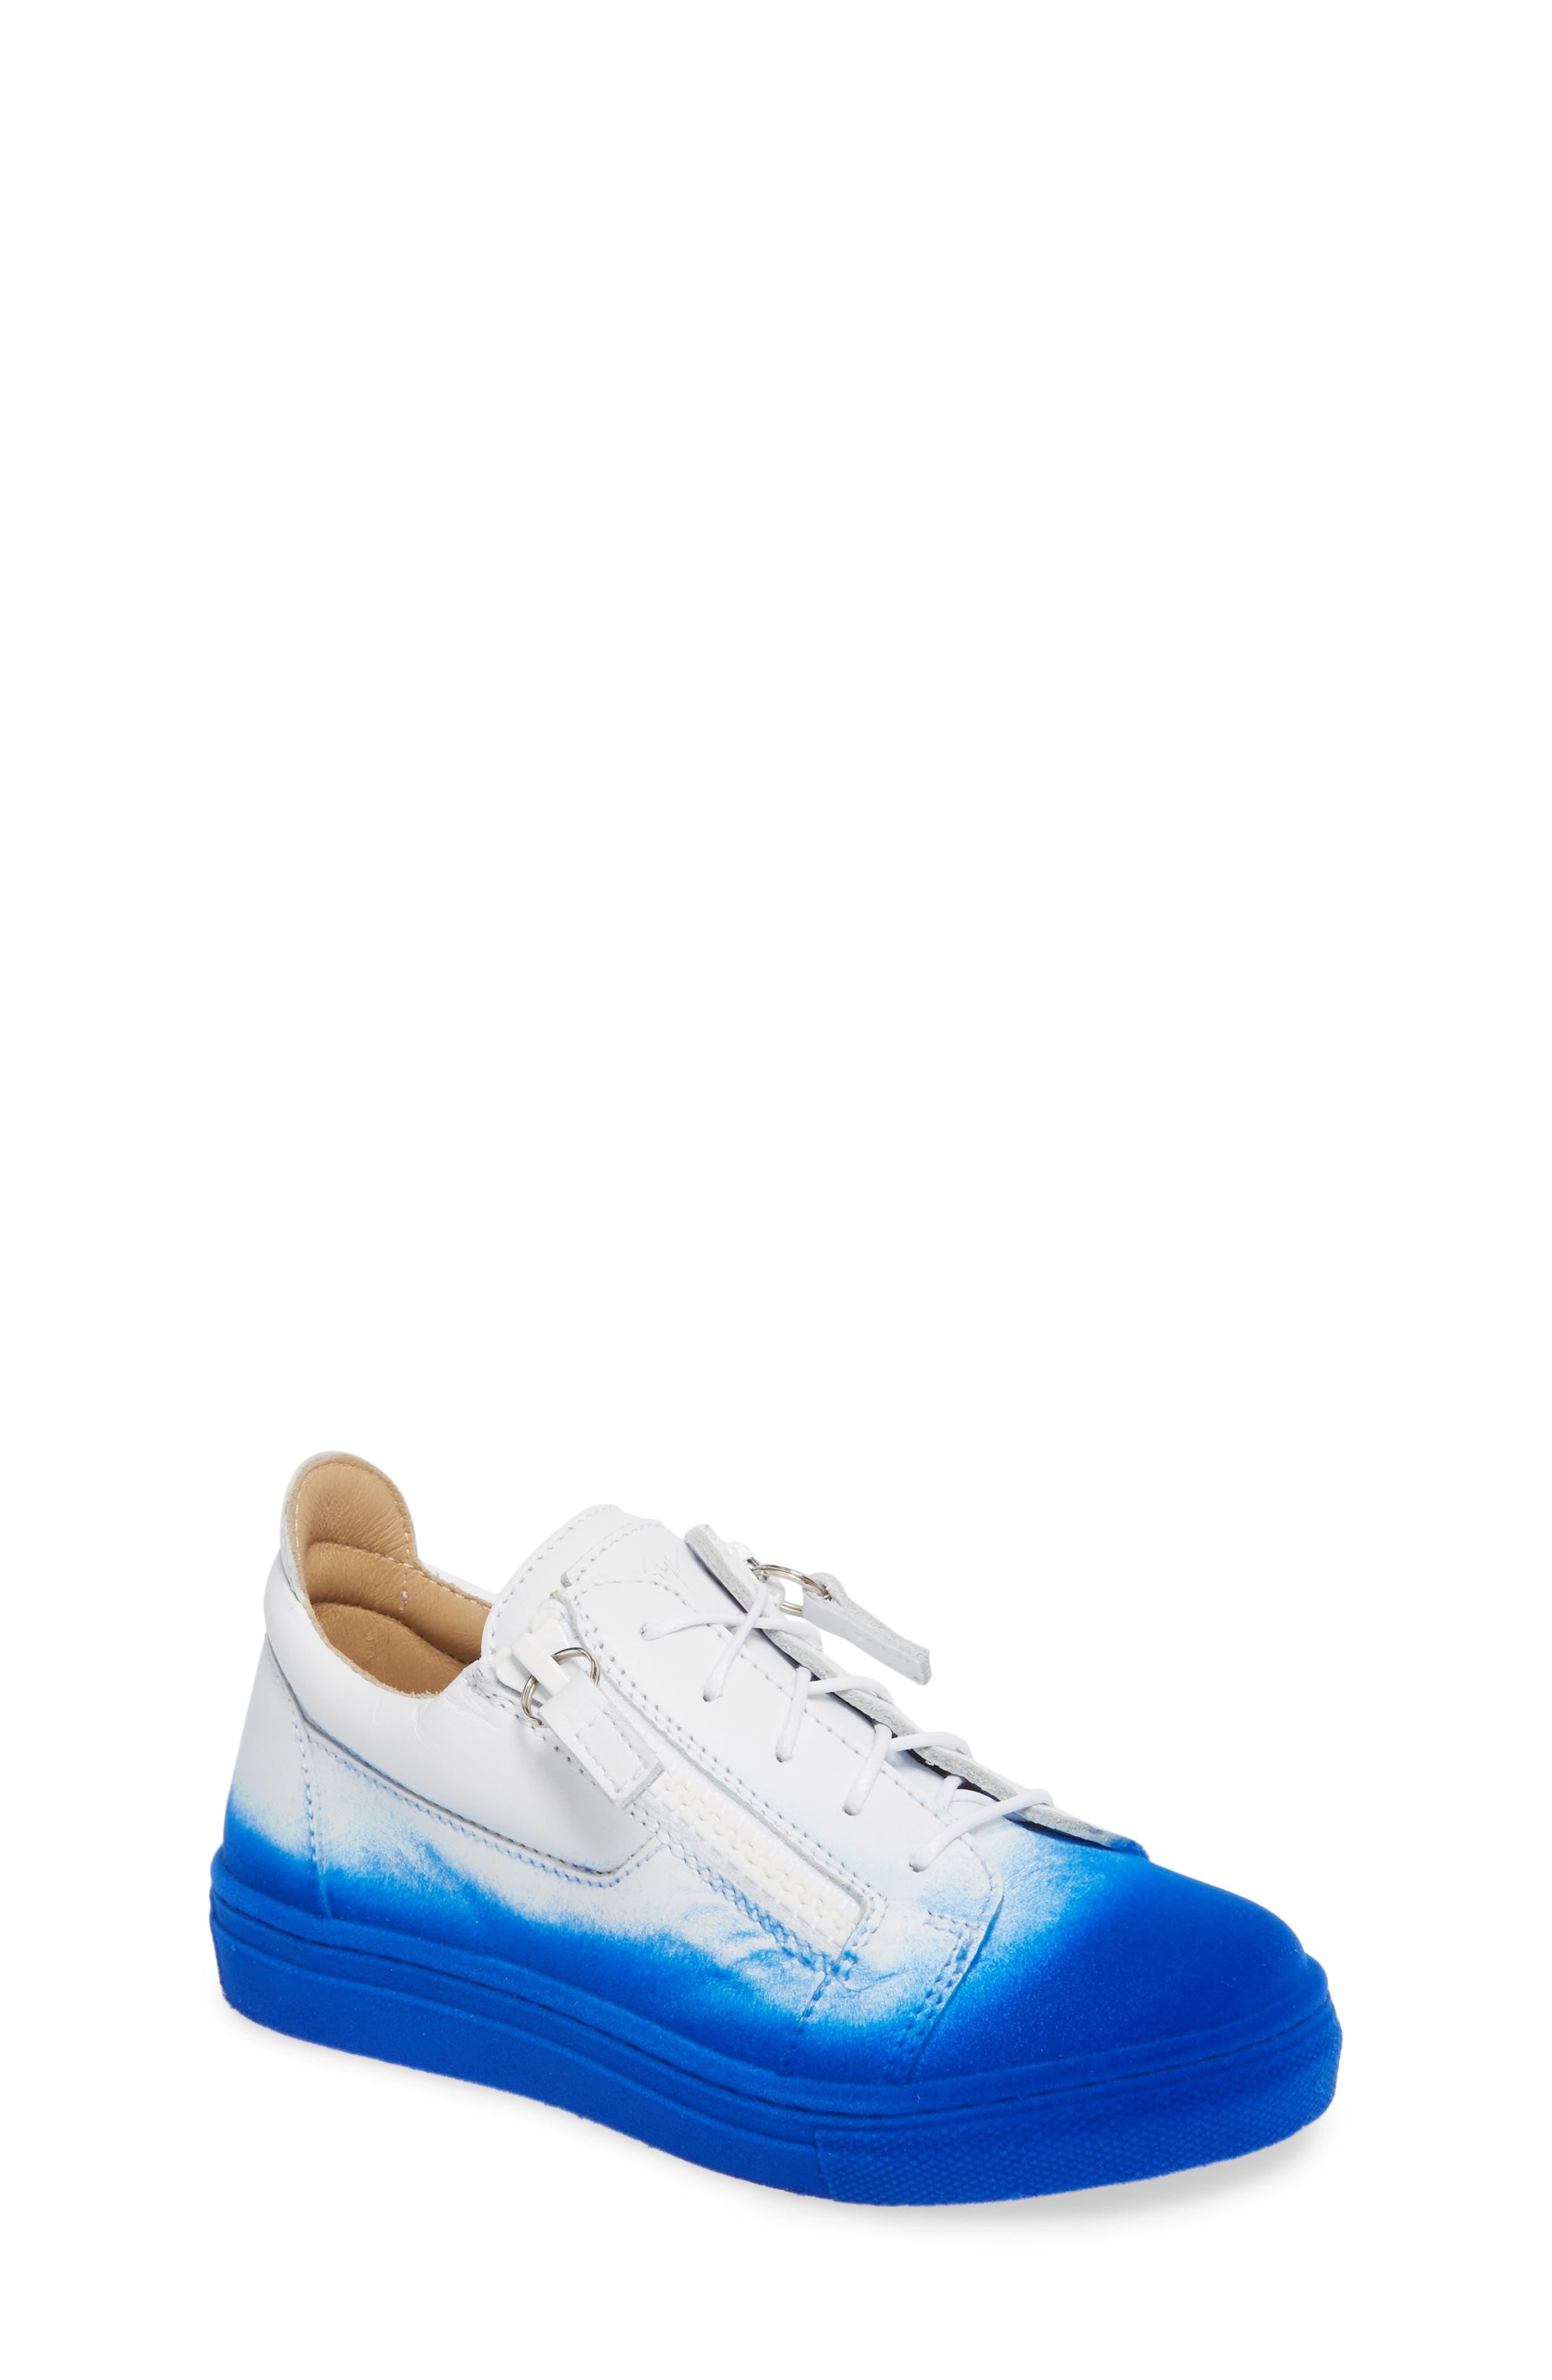 Smuggy Ombré Flocked Sneaker,                             Main thumbnail 1, color,                             BLUE/ WHITE